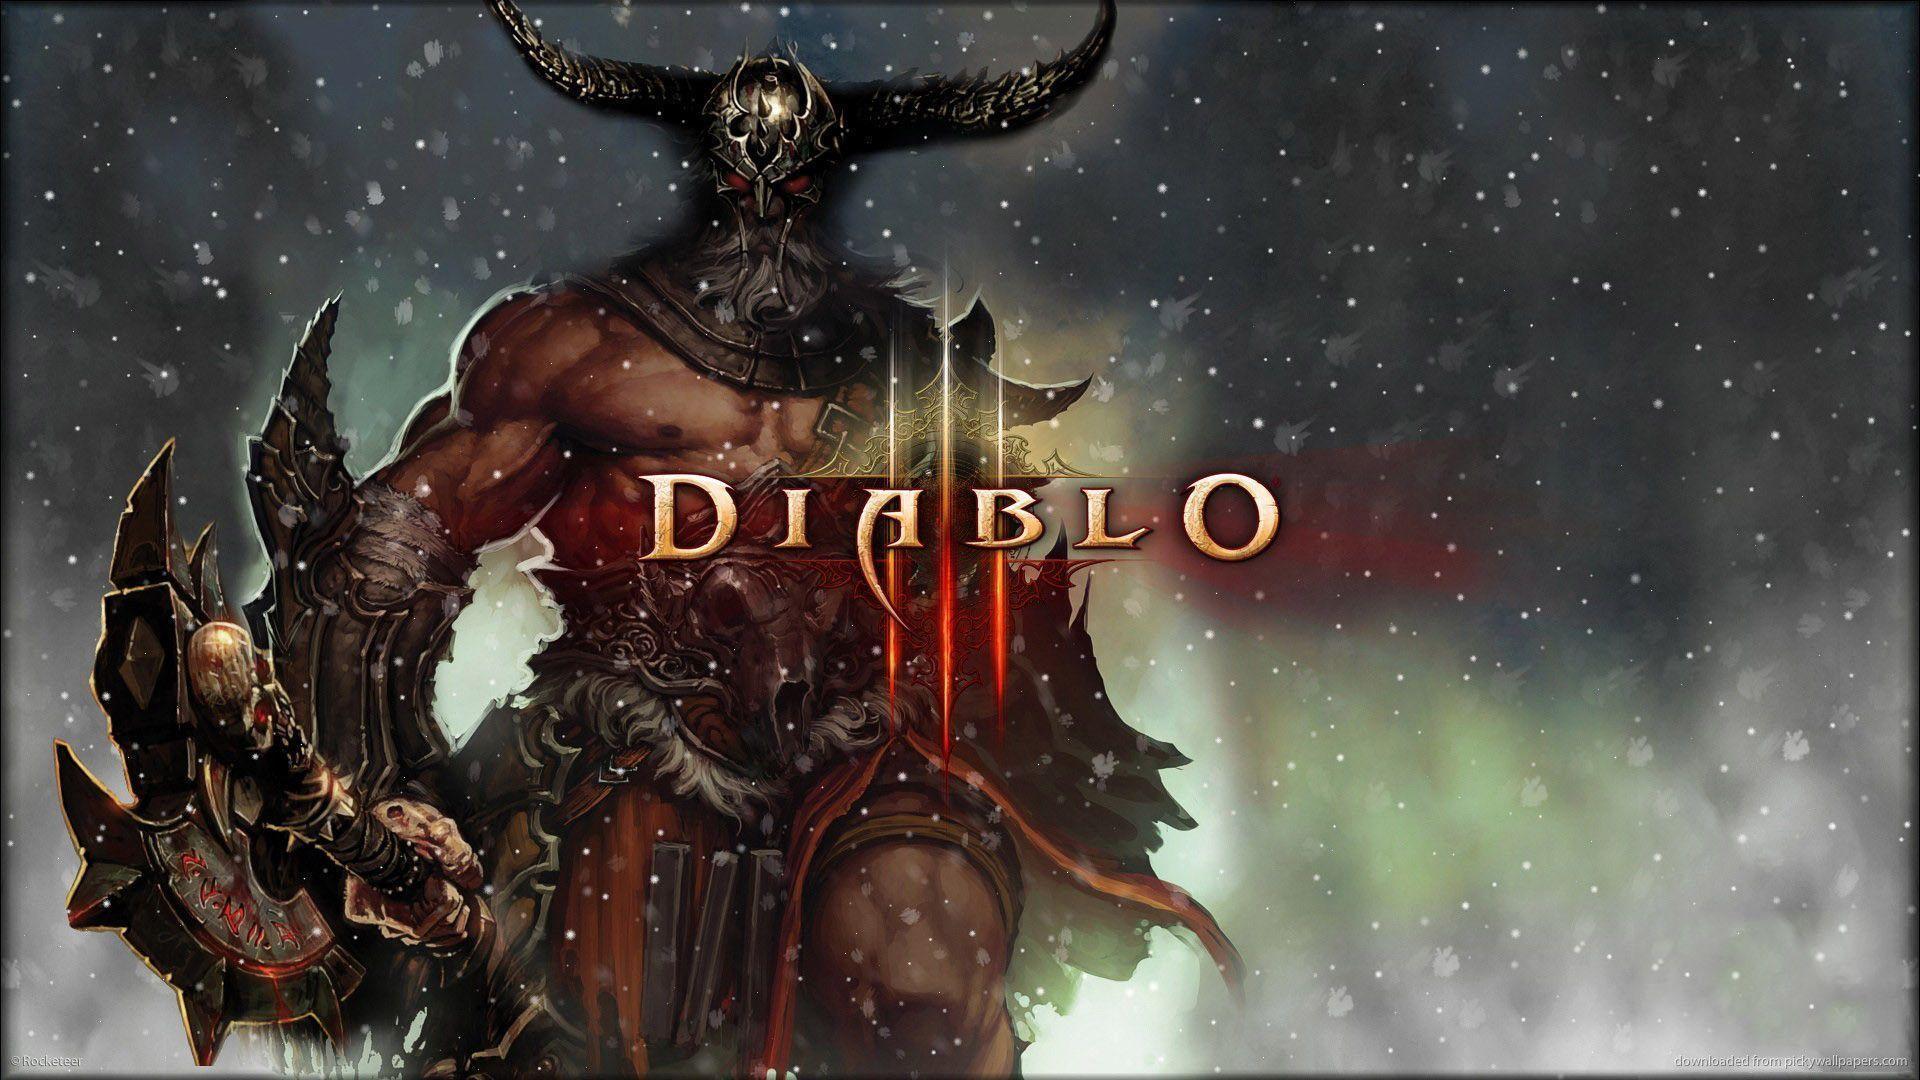 Download 1920x1080 Diablo 3 Snow Barbarian Wallpaper